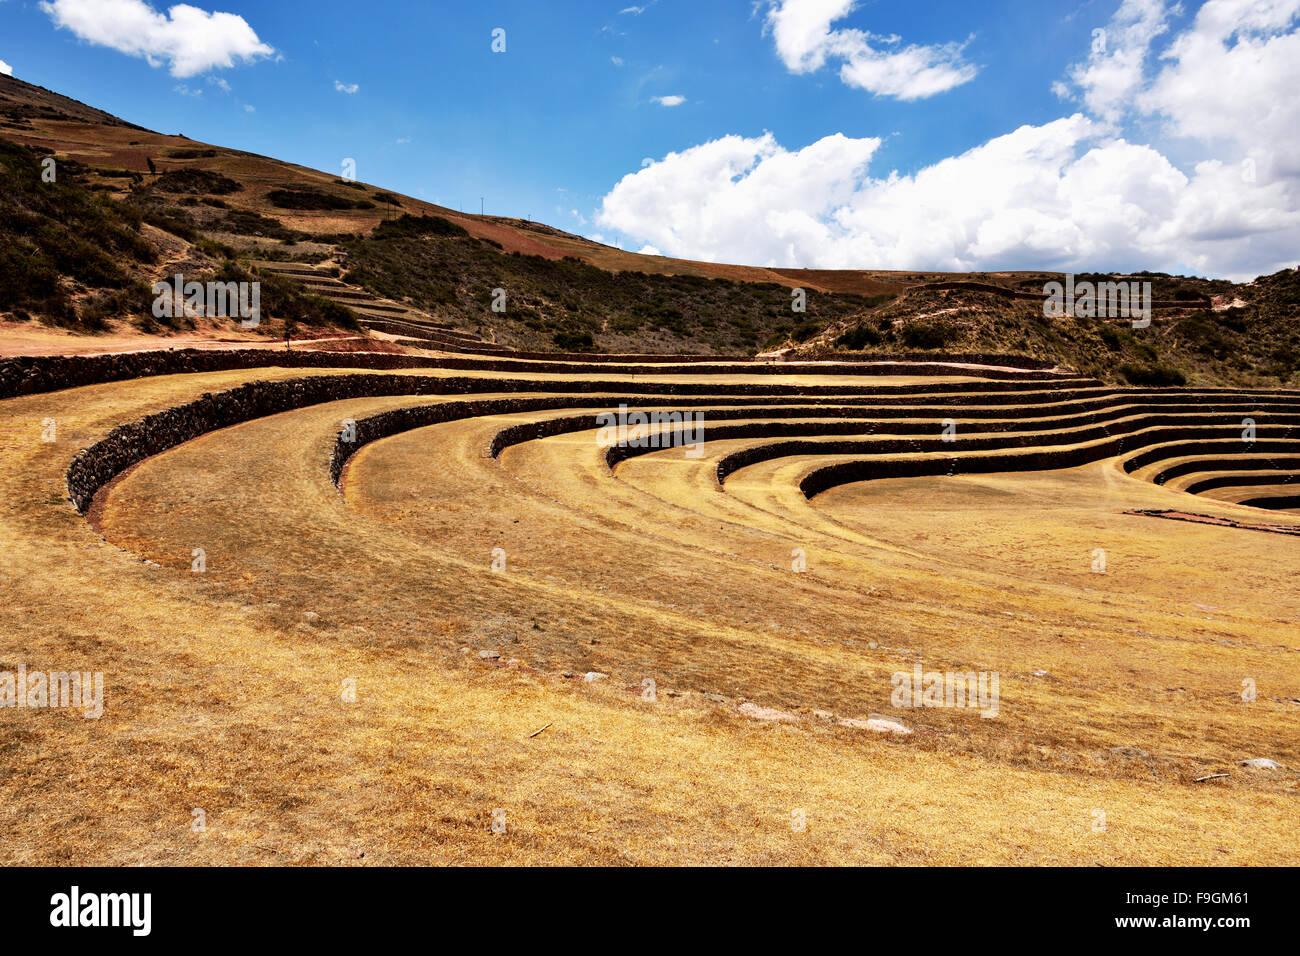 Terrazze Inca nella Valle Sacra, agricoltura, murene, Ollantaytambo, Perù Immagini Stock